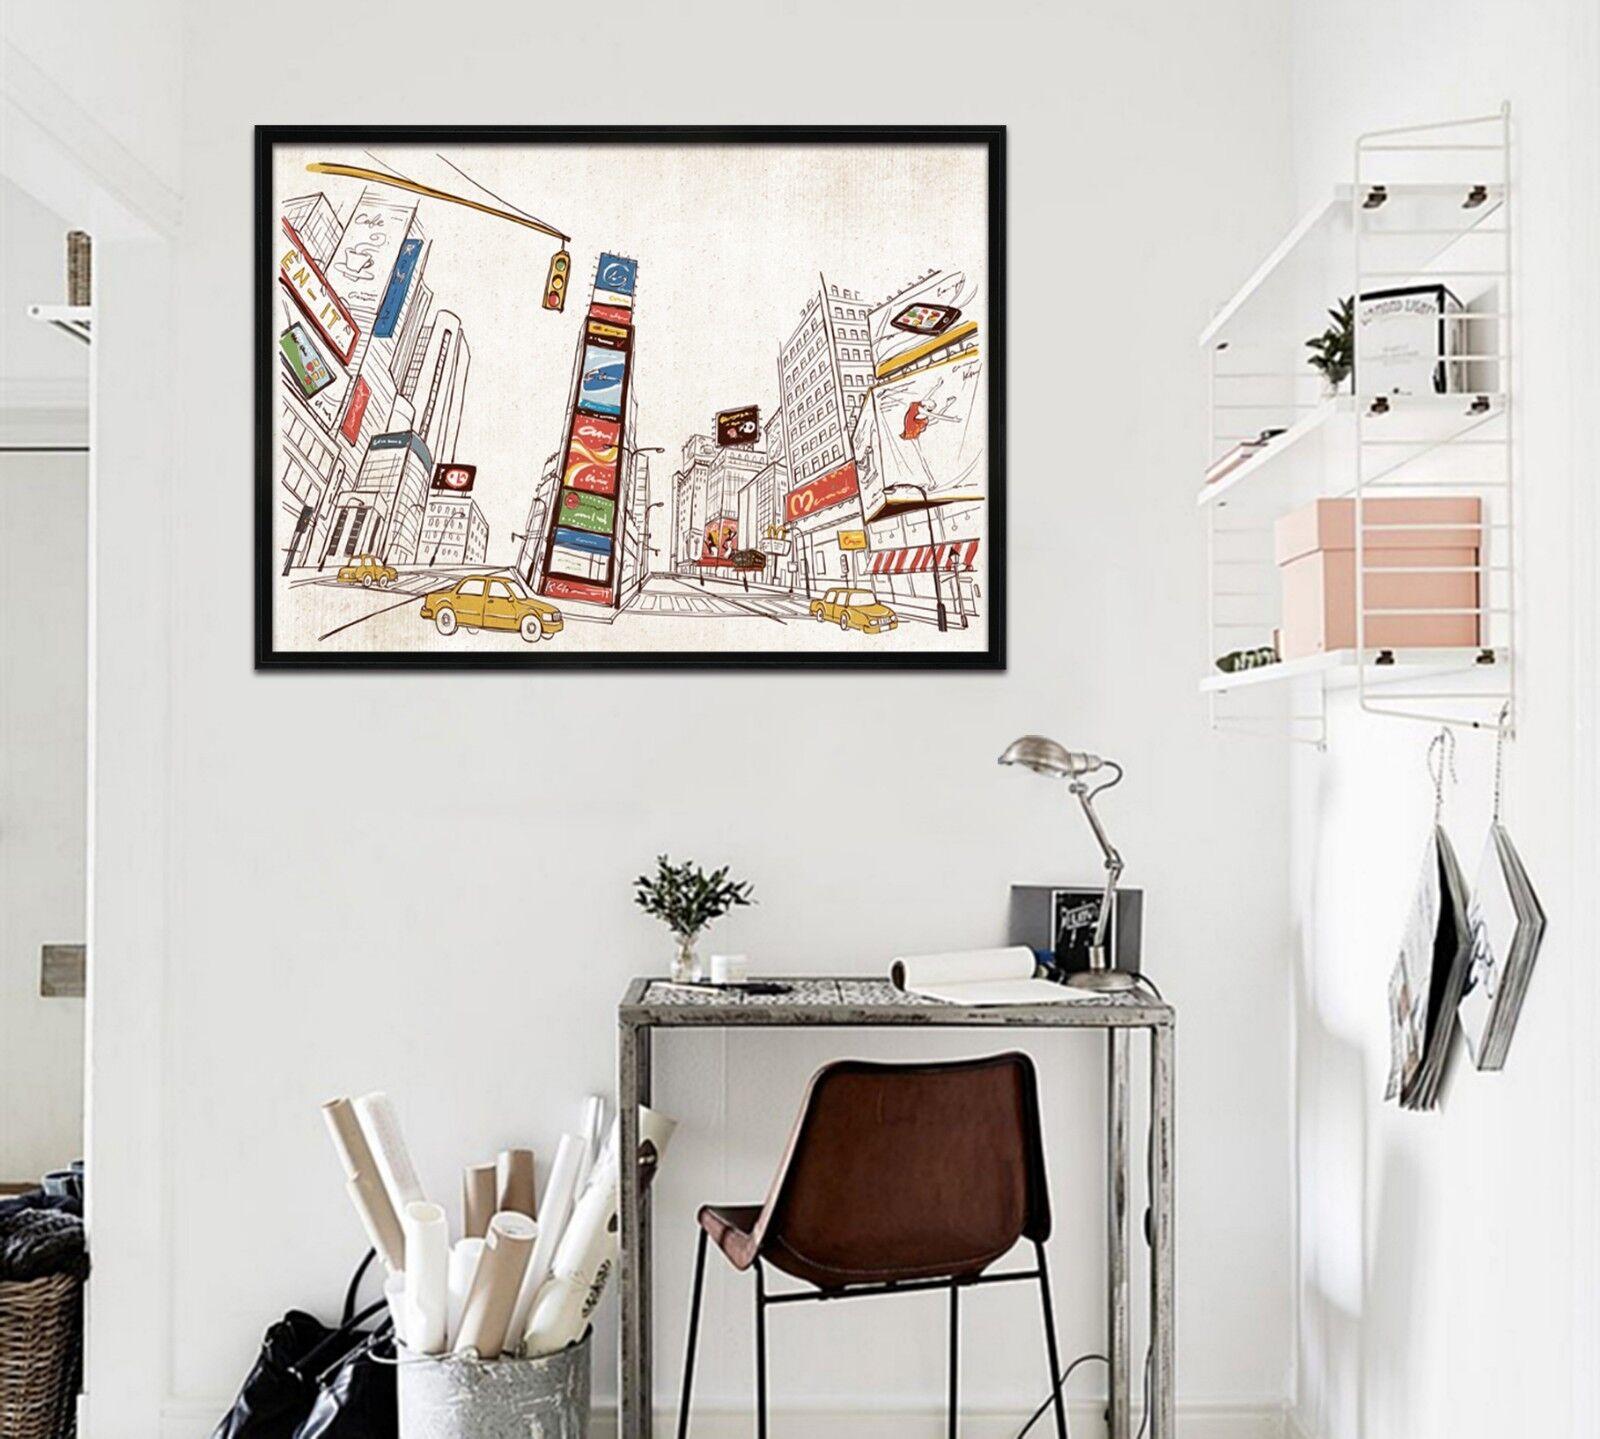 3D luz de tráfico 67 Póster Enmarcado Decoración del Hogar Pintura de Impresión Arte AJ Wallpaper